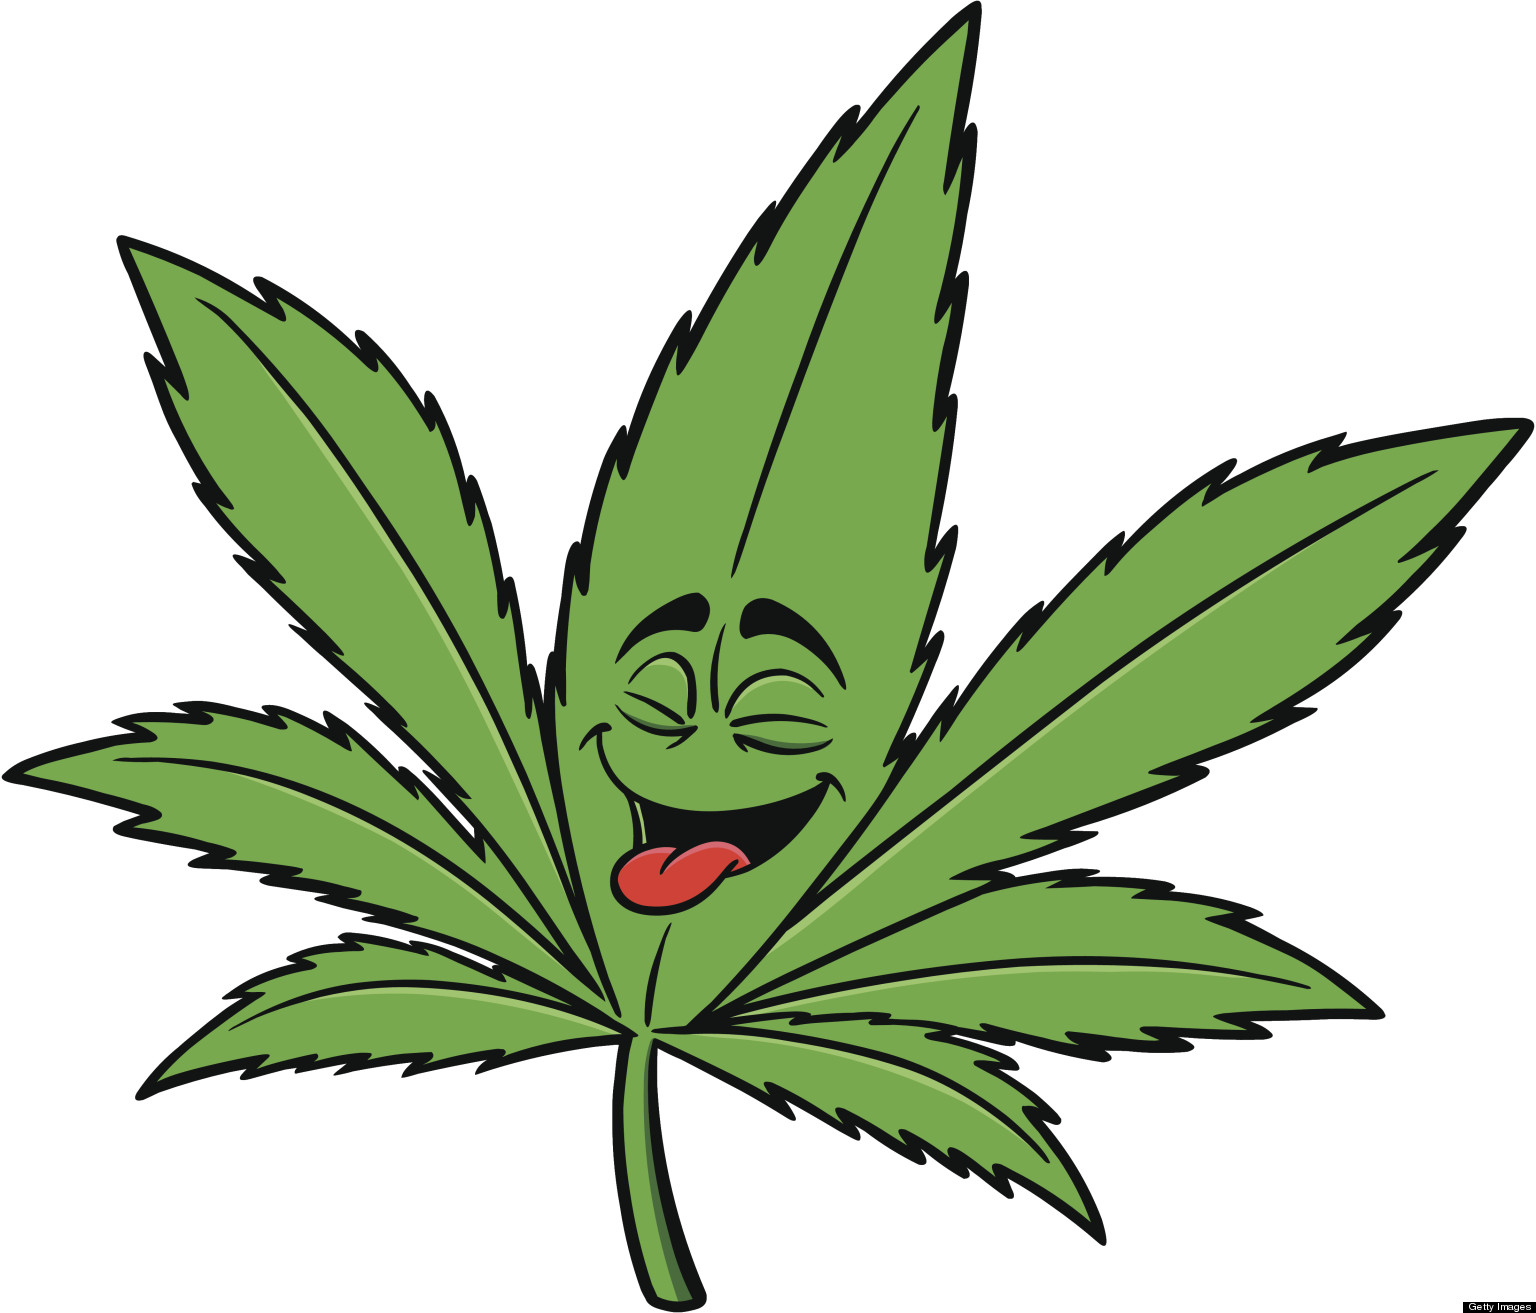 Marijuana clipart. Cannabis leaf drawing i